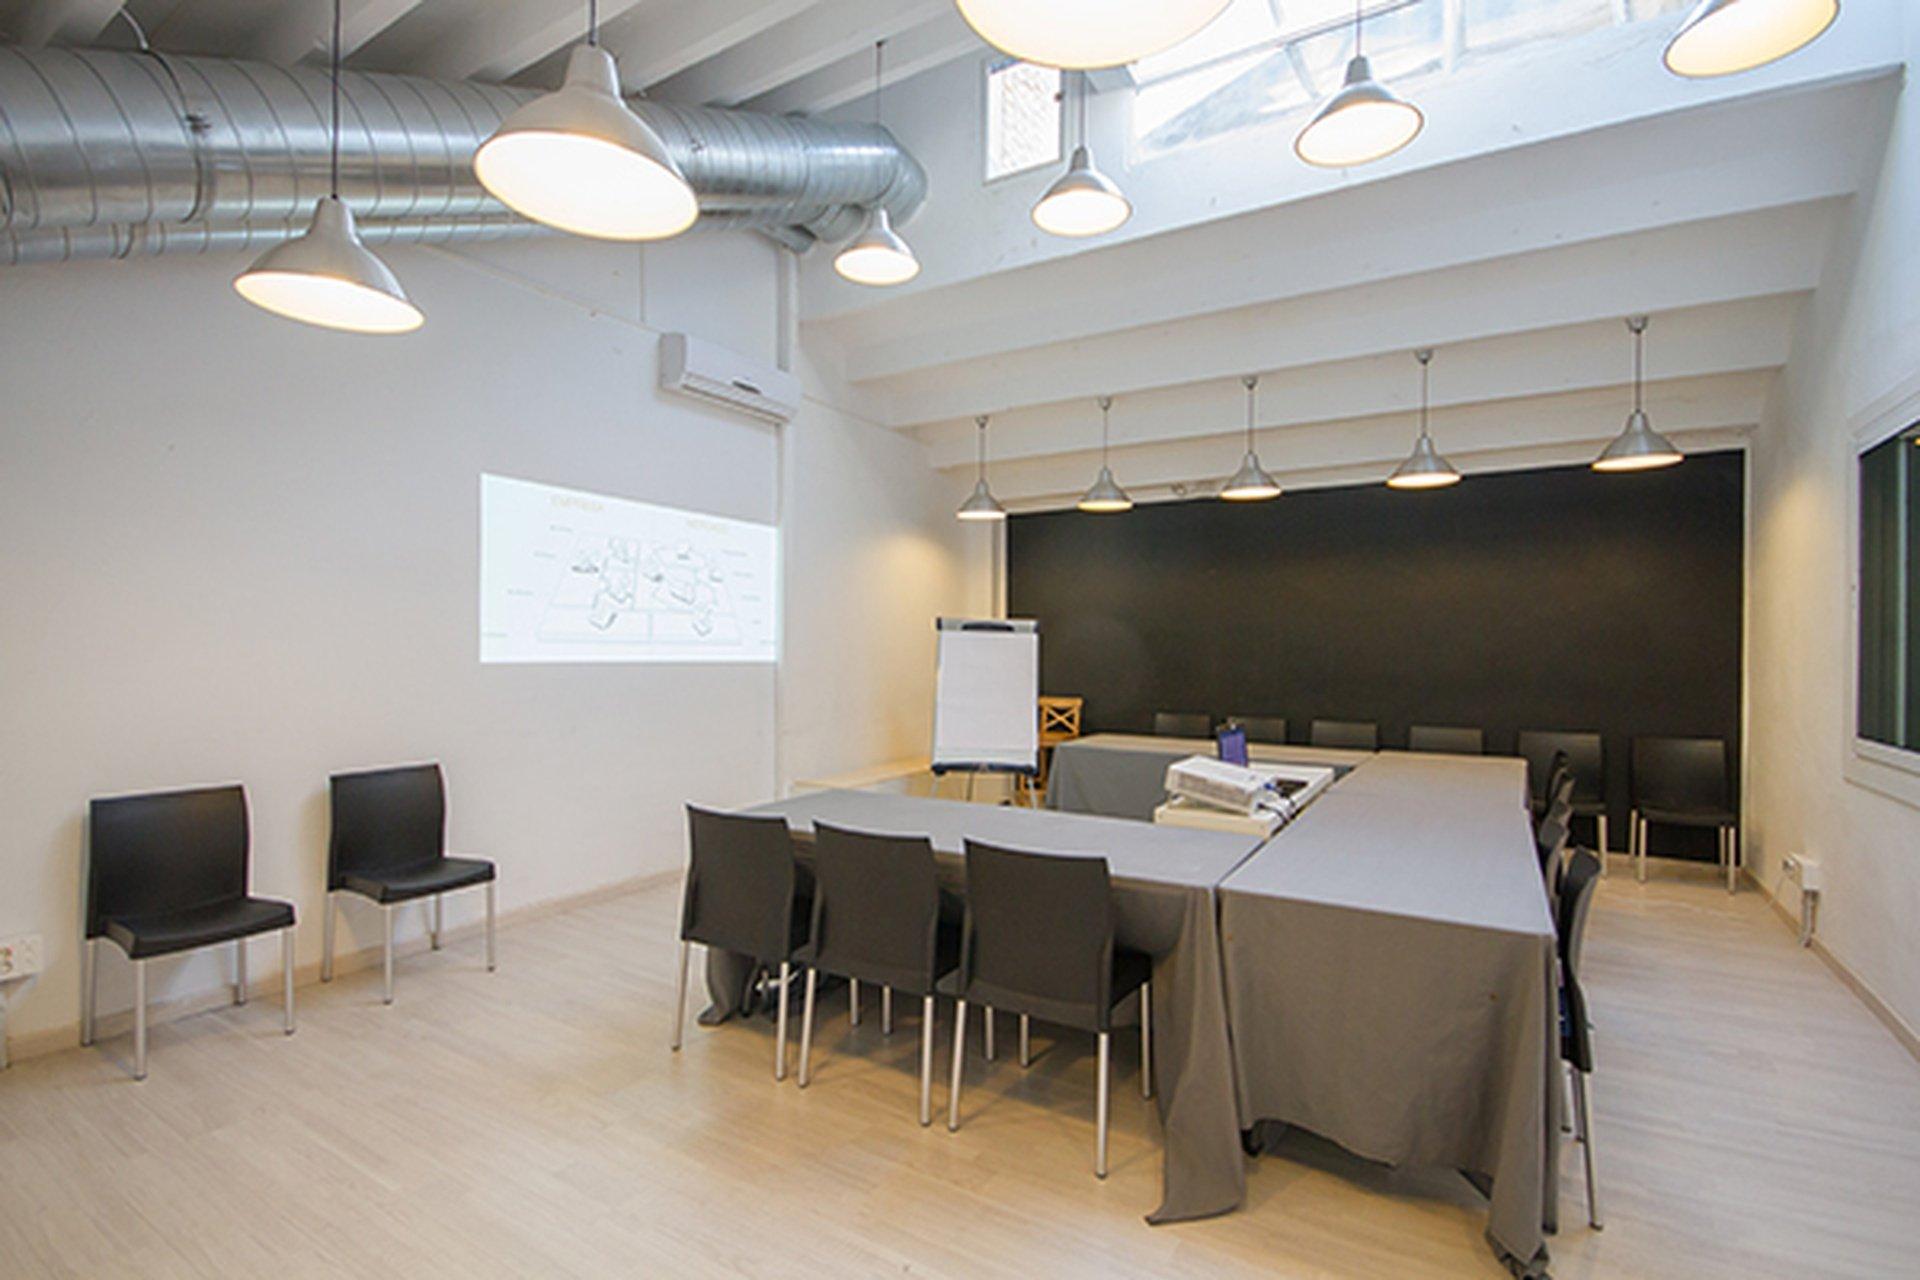 Barcelona workshop spaces Meeting room Valkiria Hub Space - Montessori Room image 0